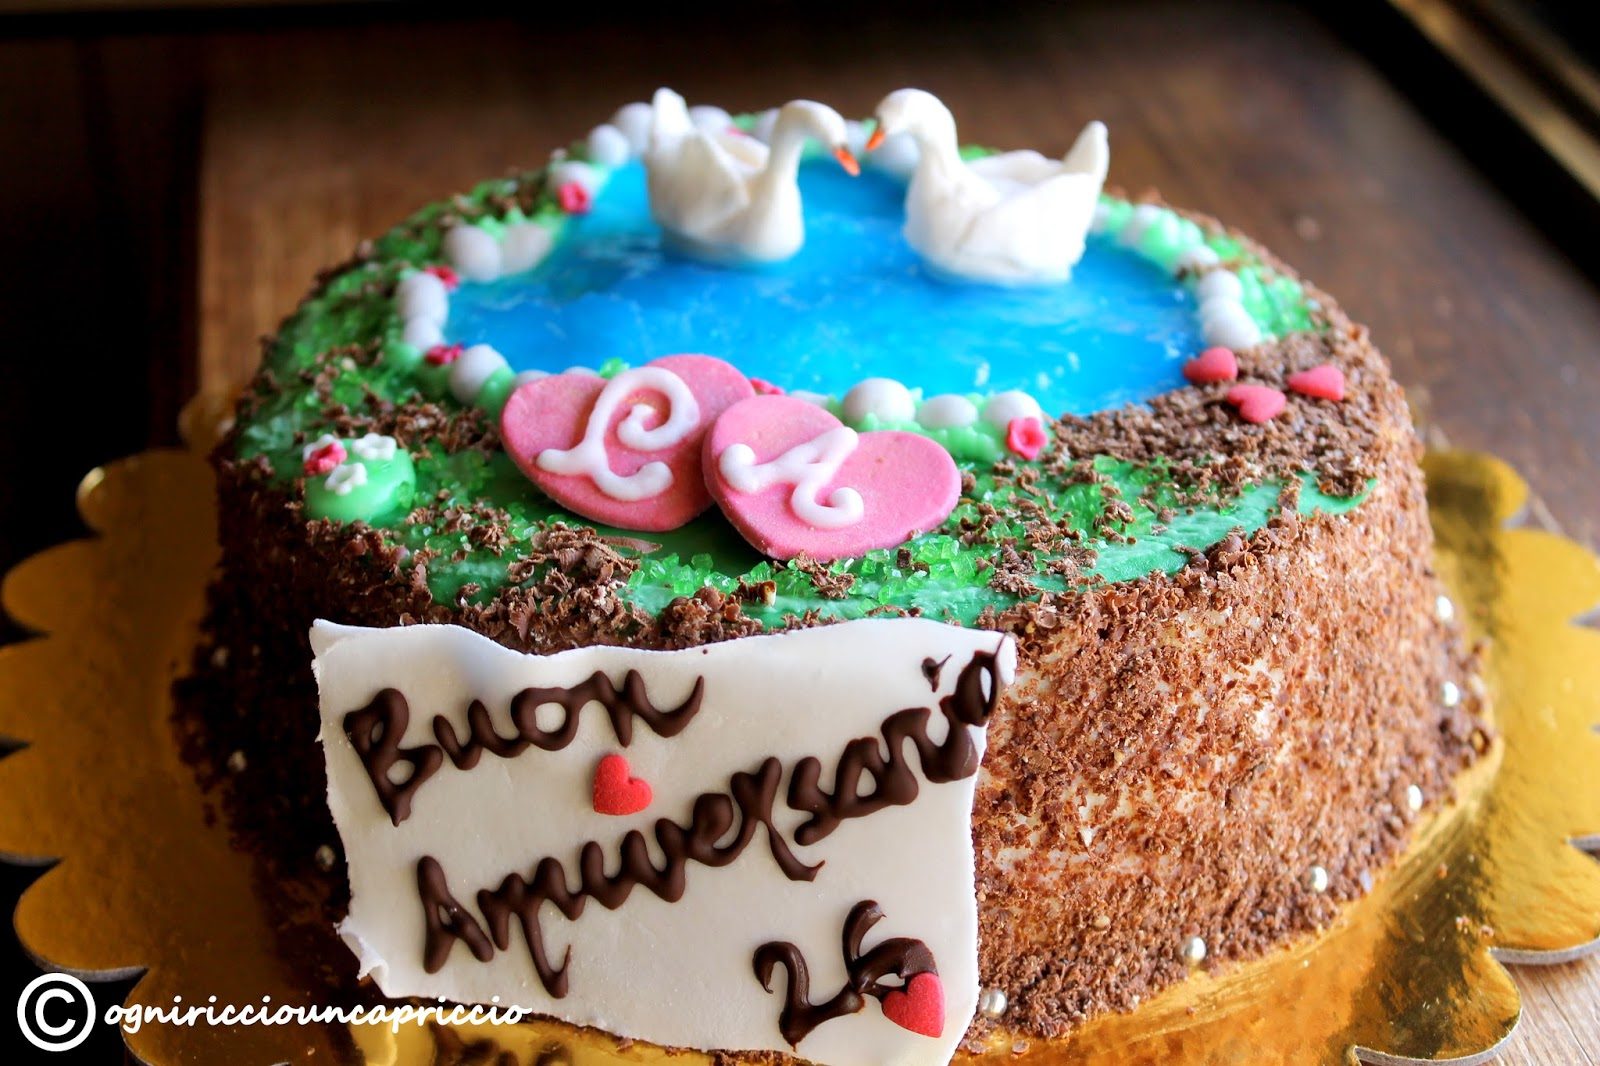 26 ° anniversario di matrimonio